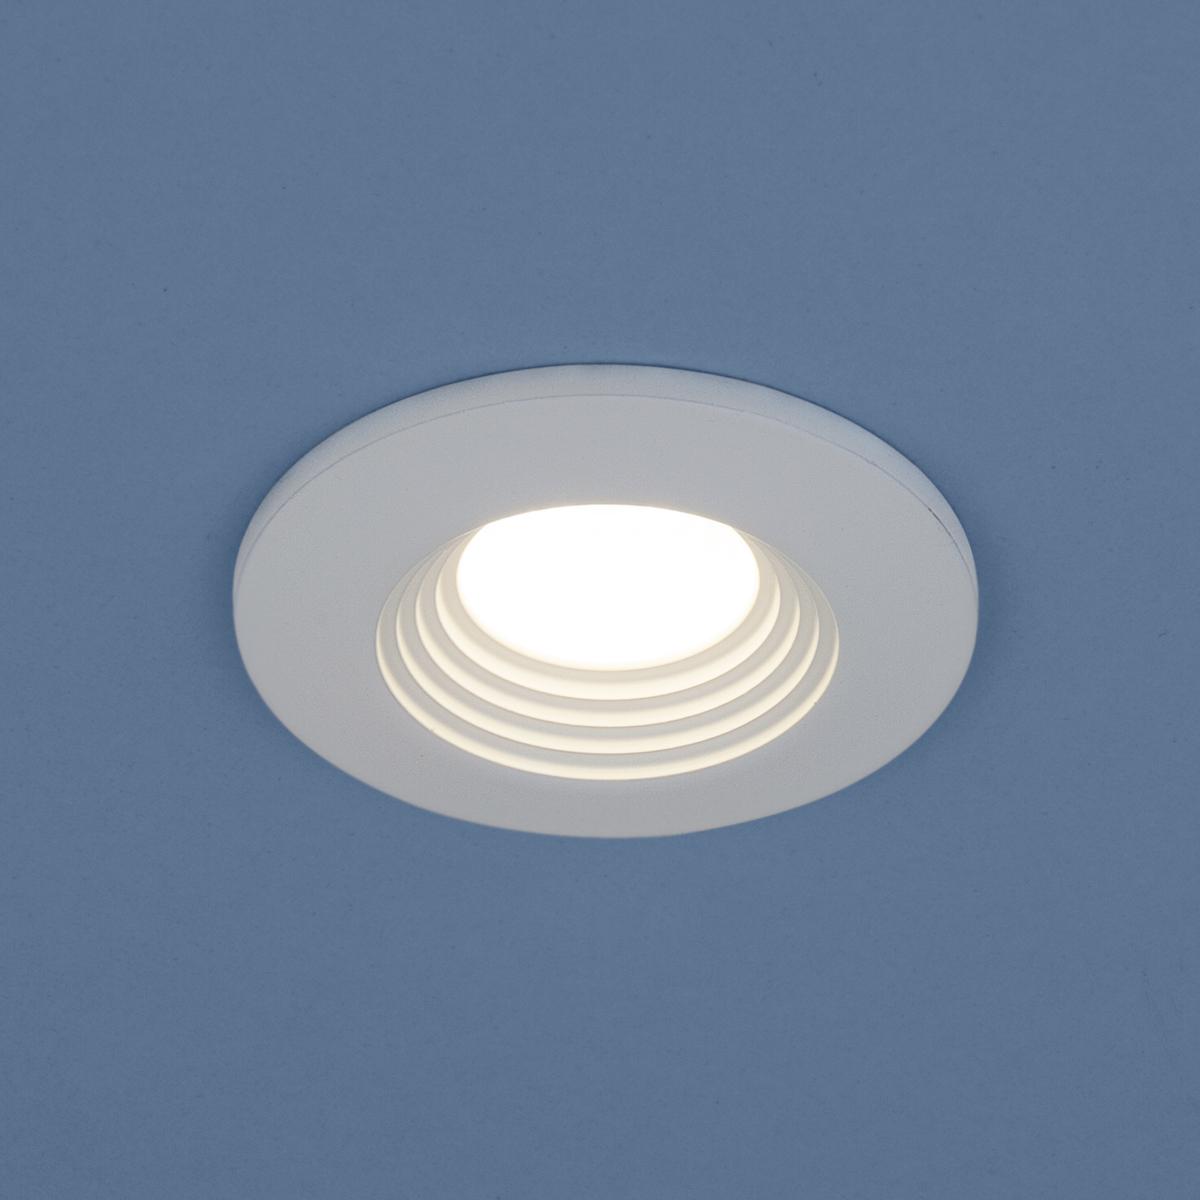 Встраиваемый светильник Elektrostandard Точечный светодиодный 9903 LED 3W COB WH jrled 3w 300lm 6500k 21 cob led white light modules white beige 5 pcs dc 10 11v